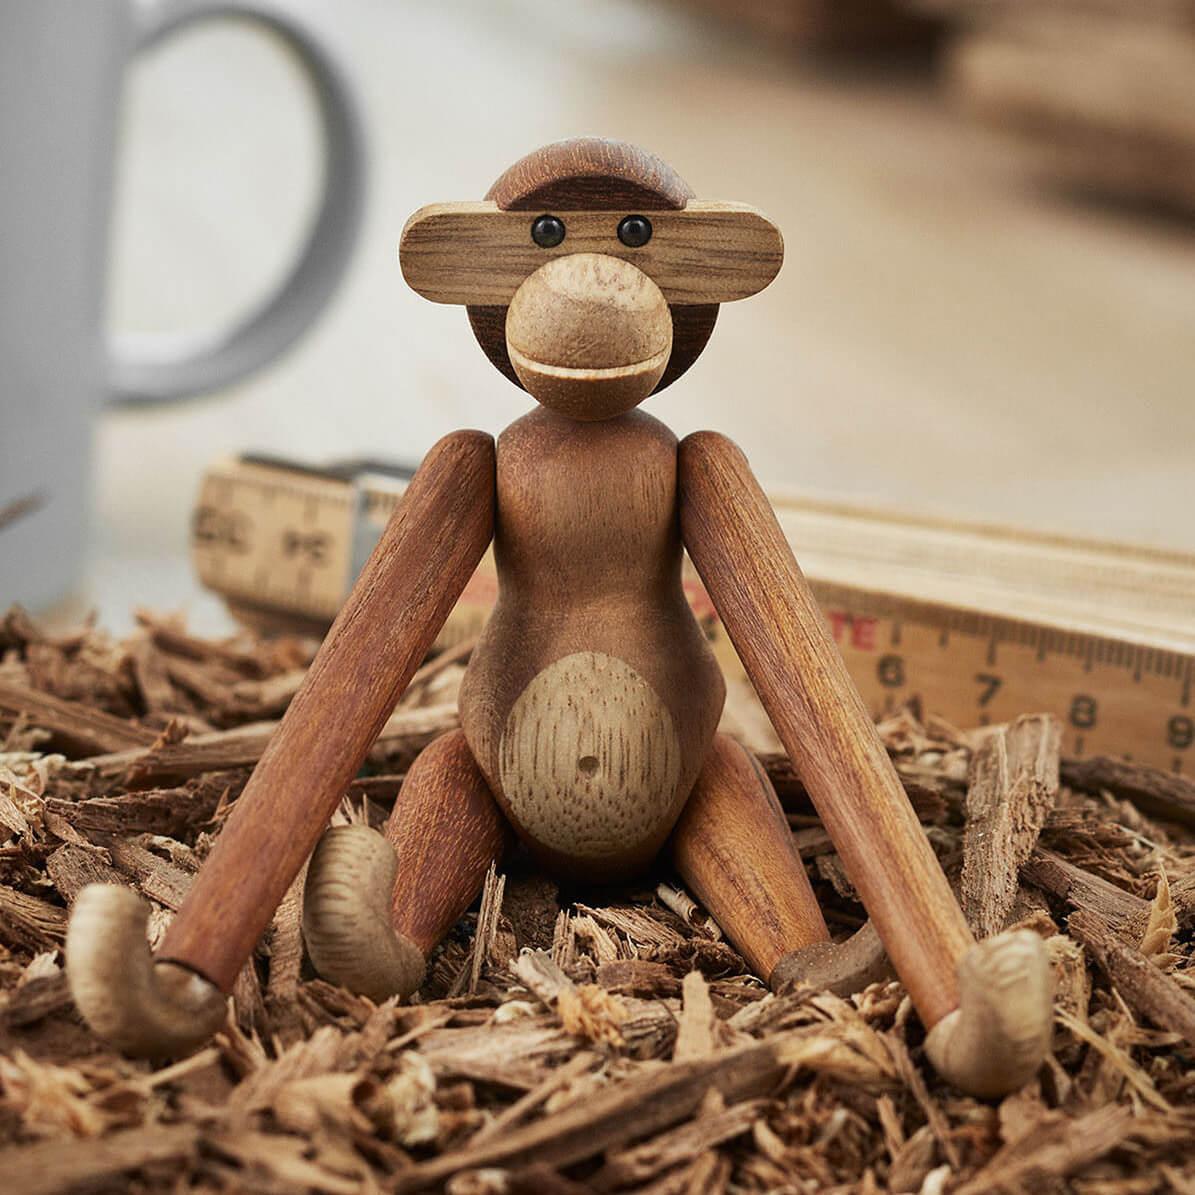 Kay Bojesen Holzfigur Affe Teak Mini H 10 X B 9 X T Ca